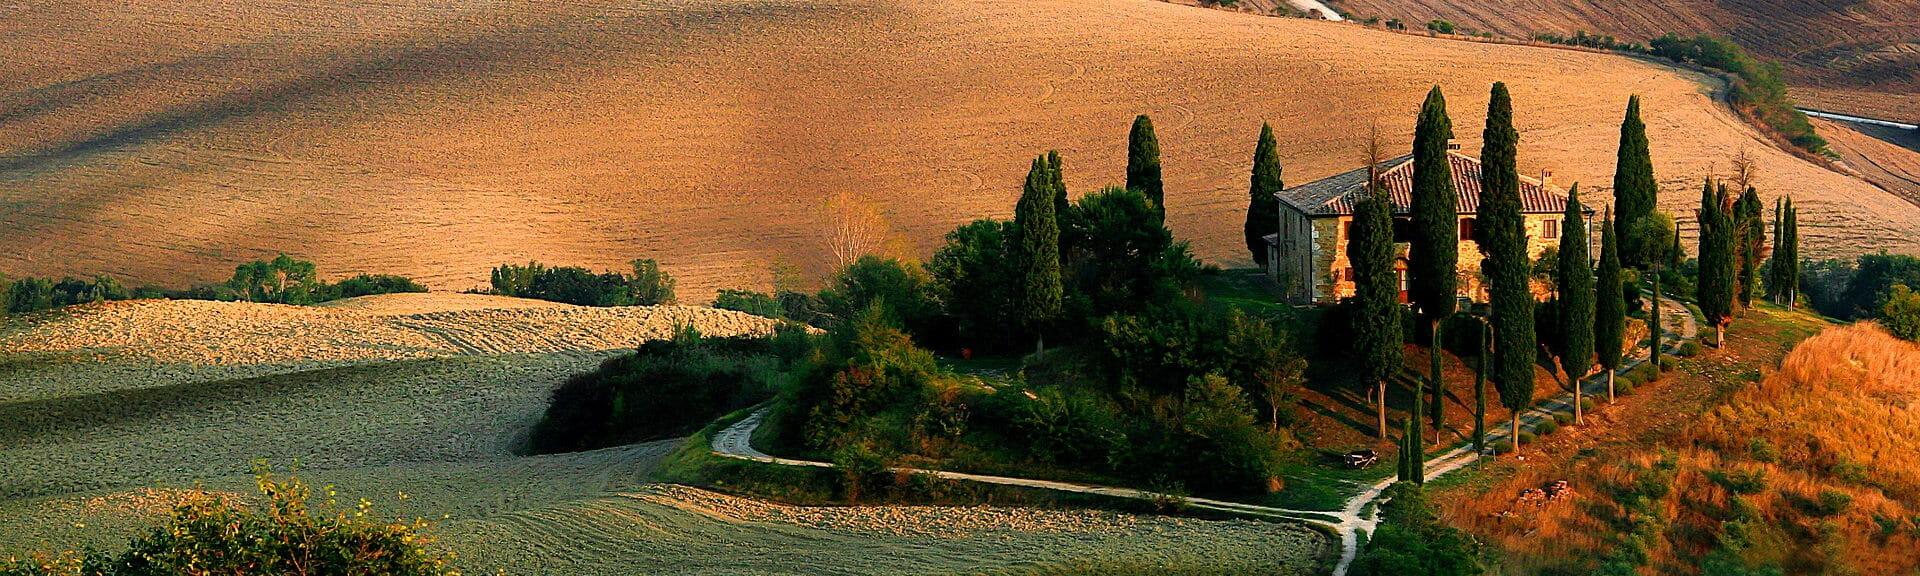 Klassenfahrt Toskana Landschaft